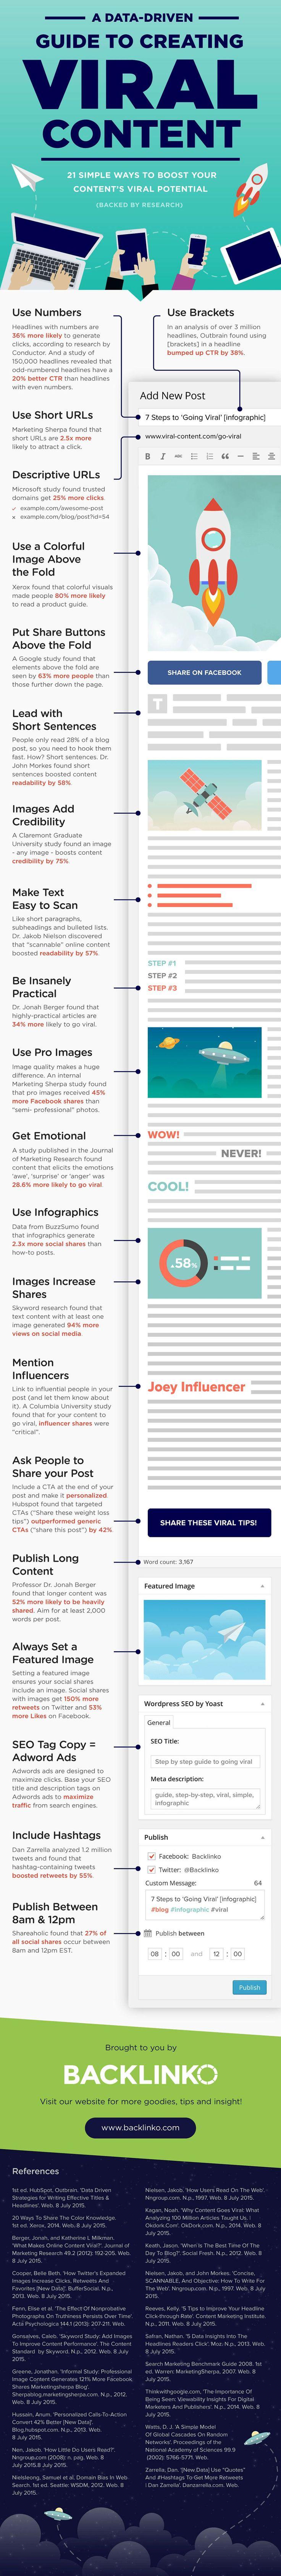 How to Make a Blog Post Go Viral Infographic. Topic: blogger, blogging, online marketing, social media optimization, clickbait, linkbait.